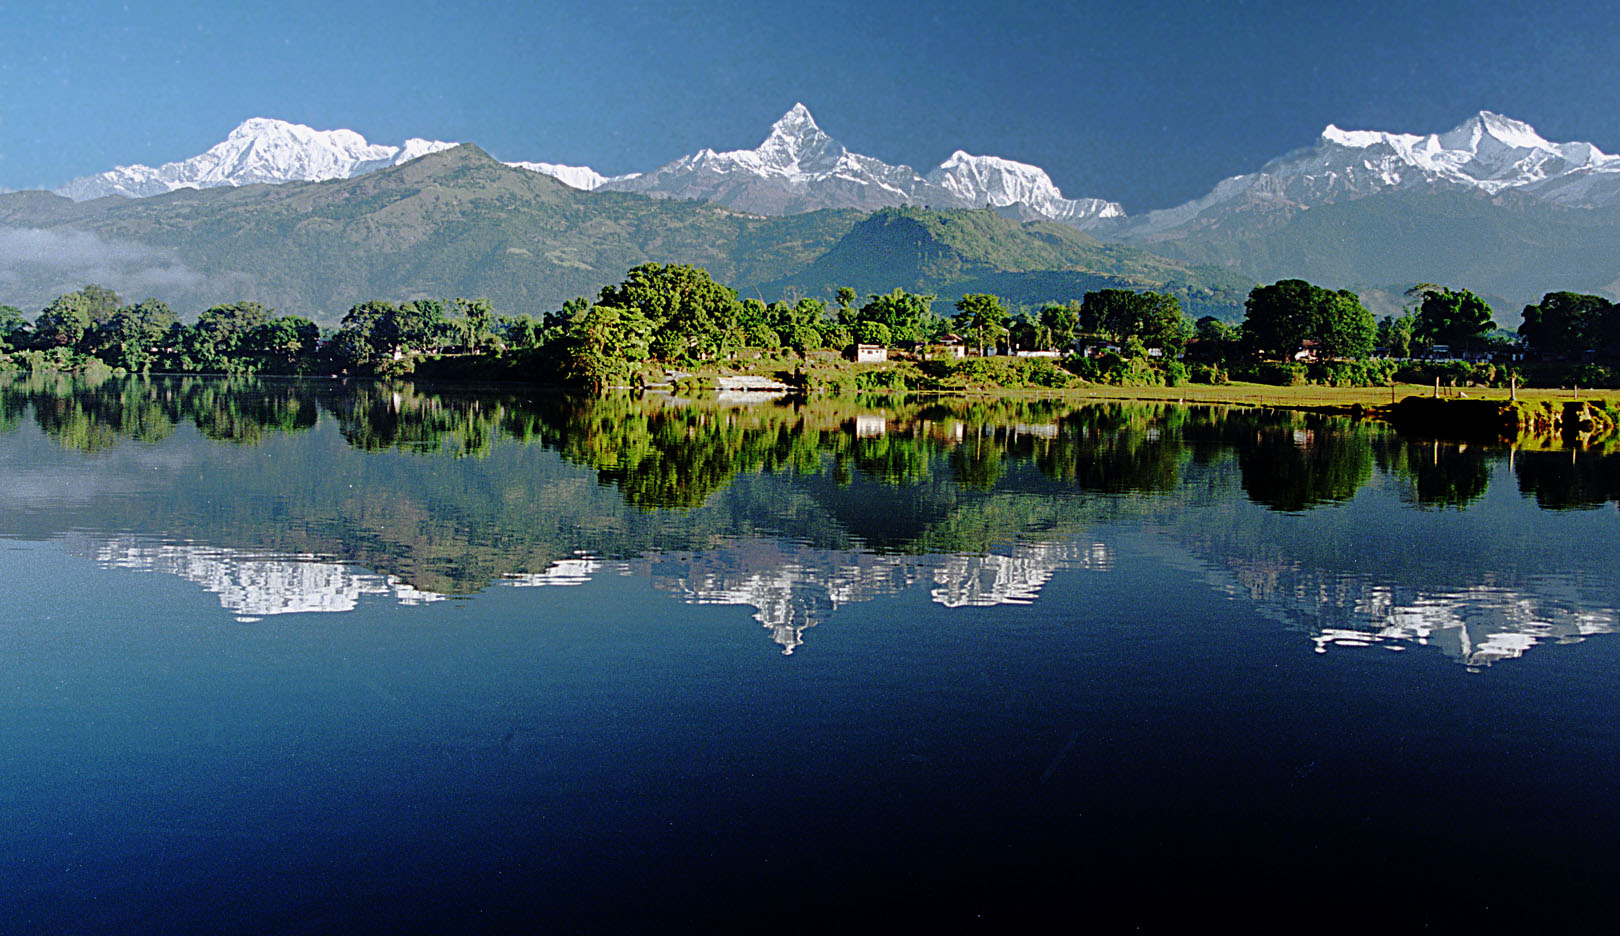 Nepal honeymoon Experience Smile Youre at the best WordPresscom 1620x936